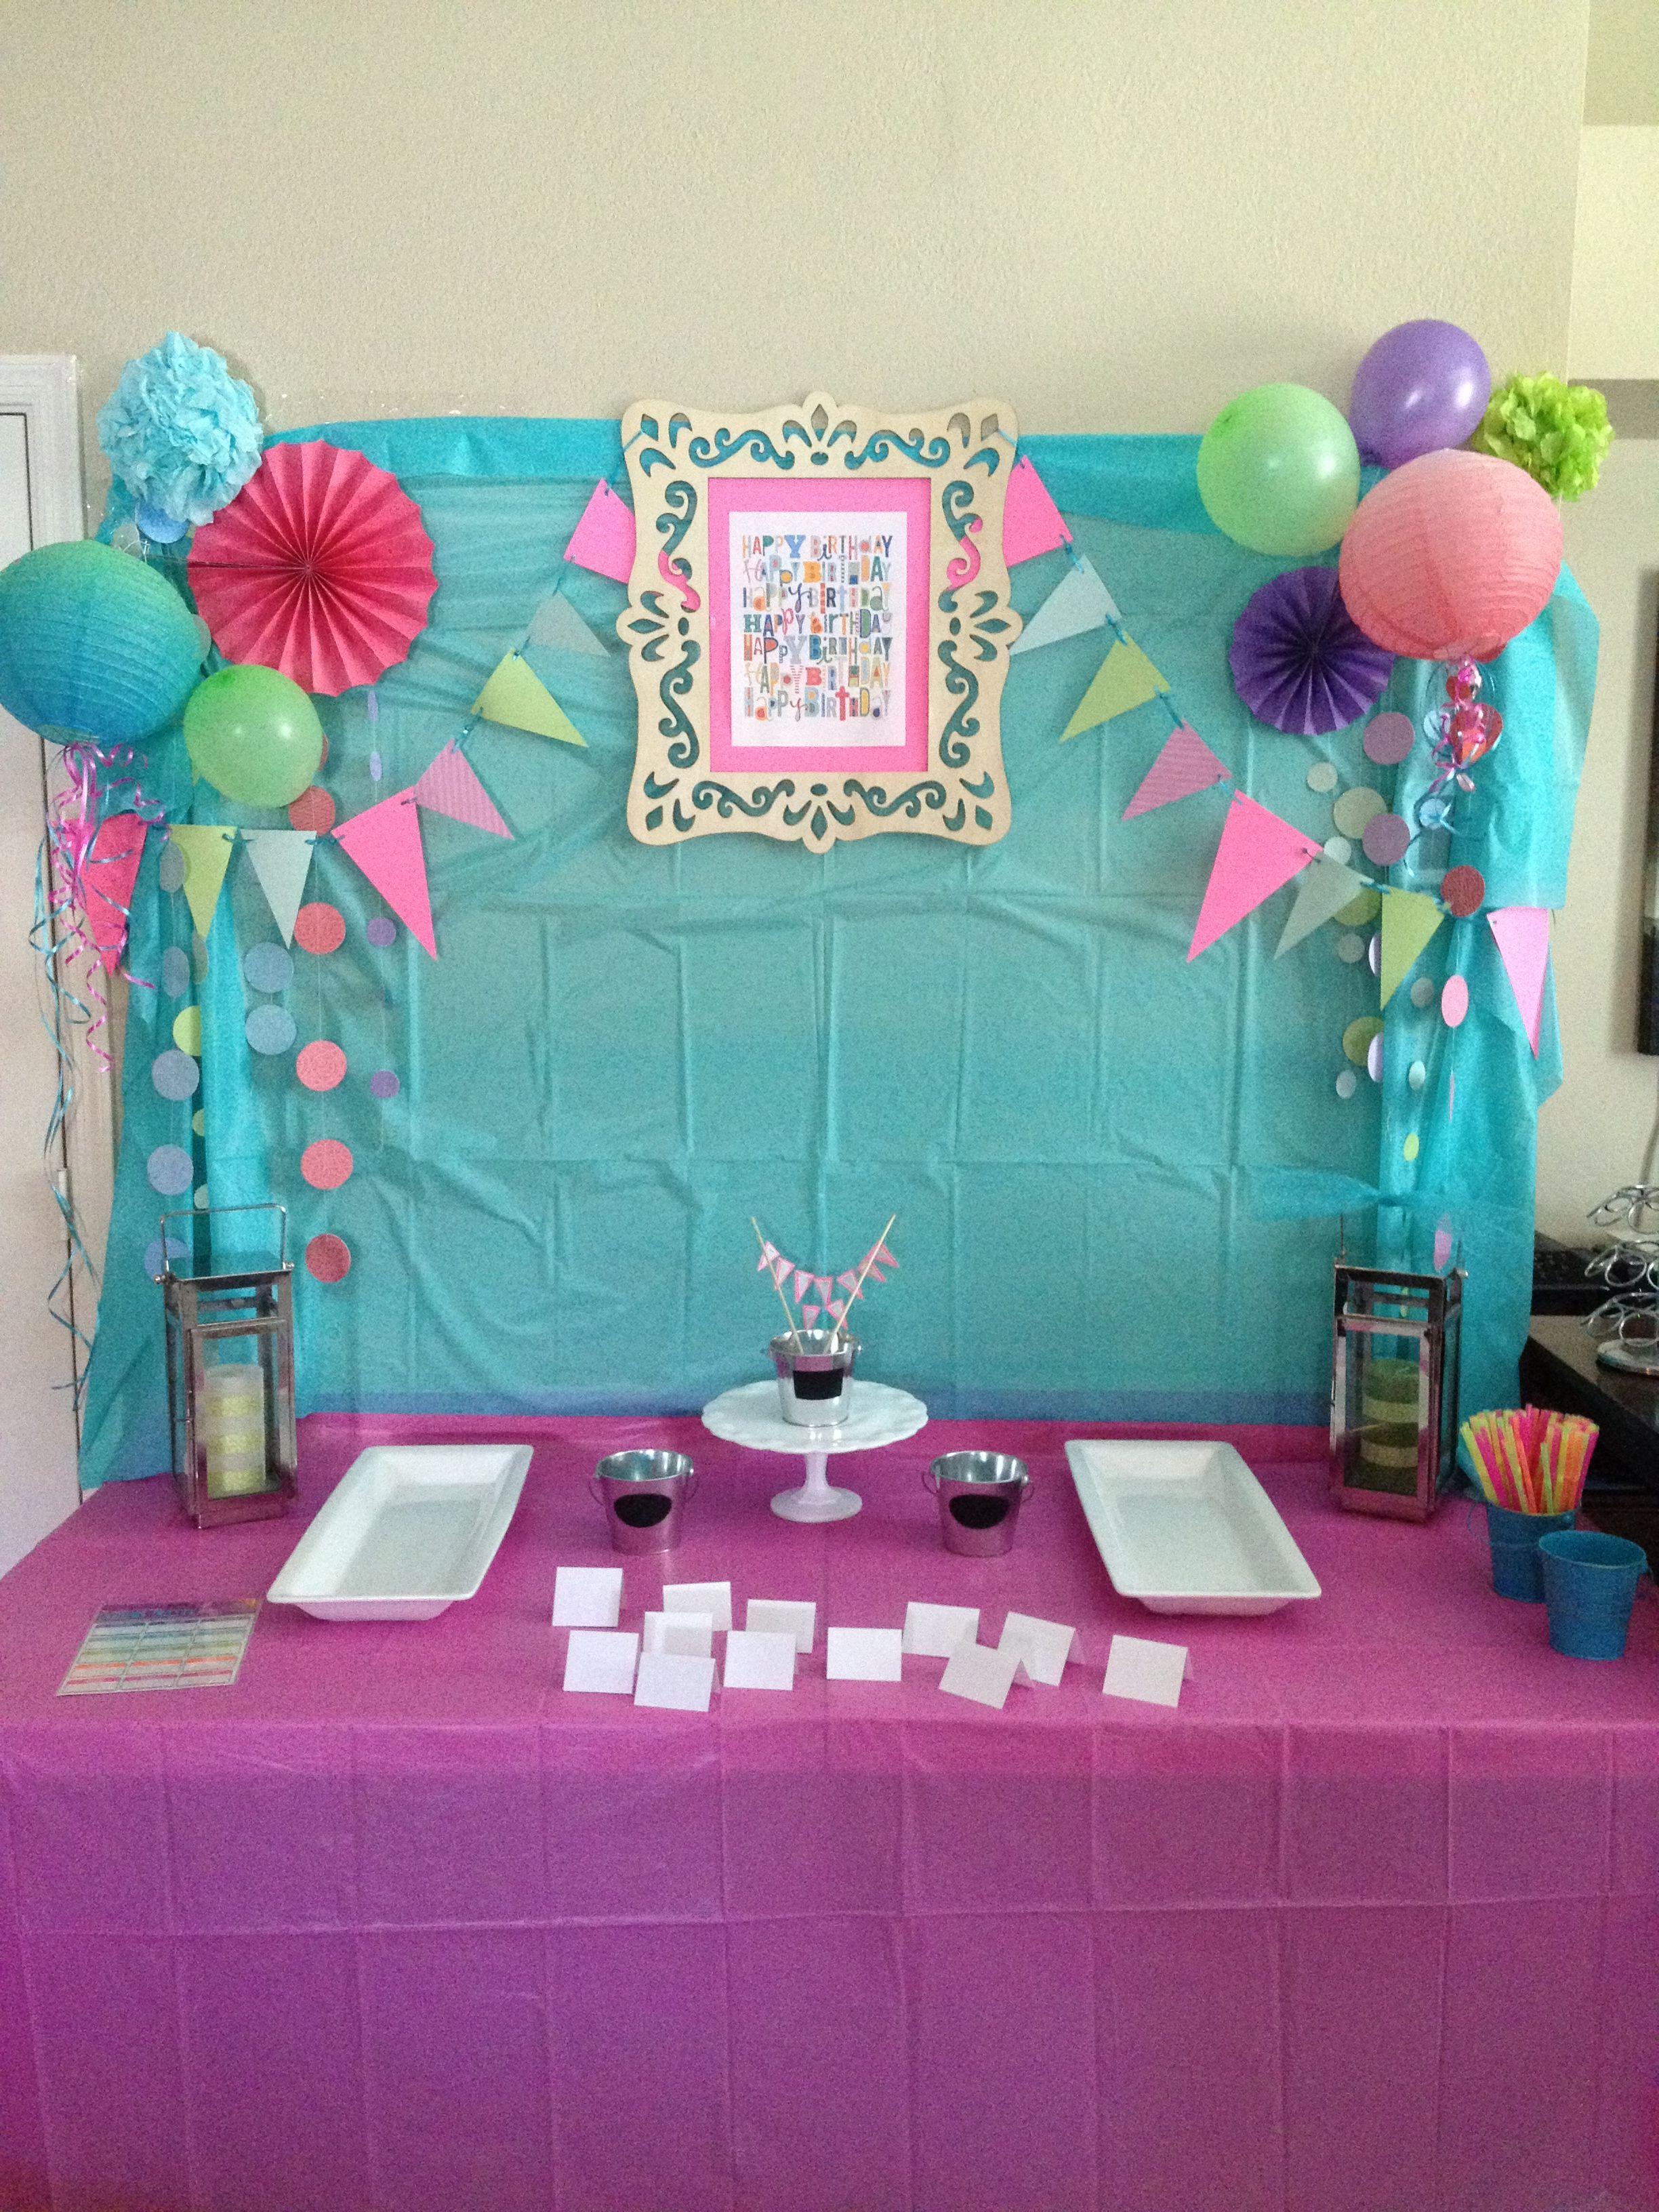 10th Birthday Party Background 10th Birthday Parties Birthday Party Background 10th Birthday